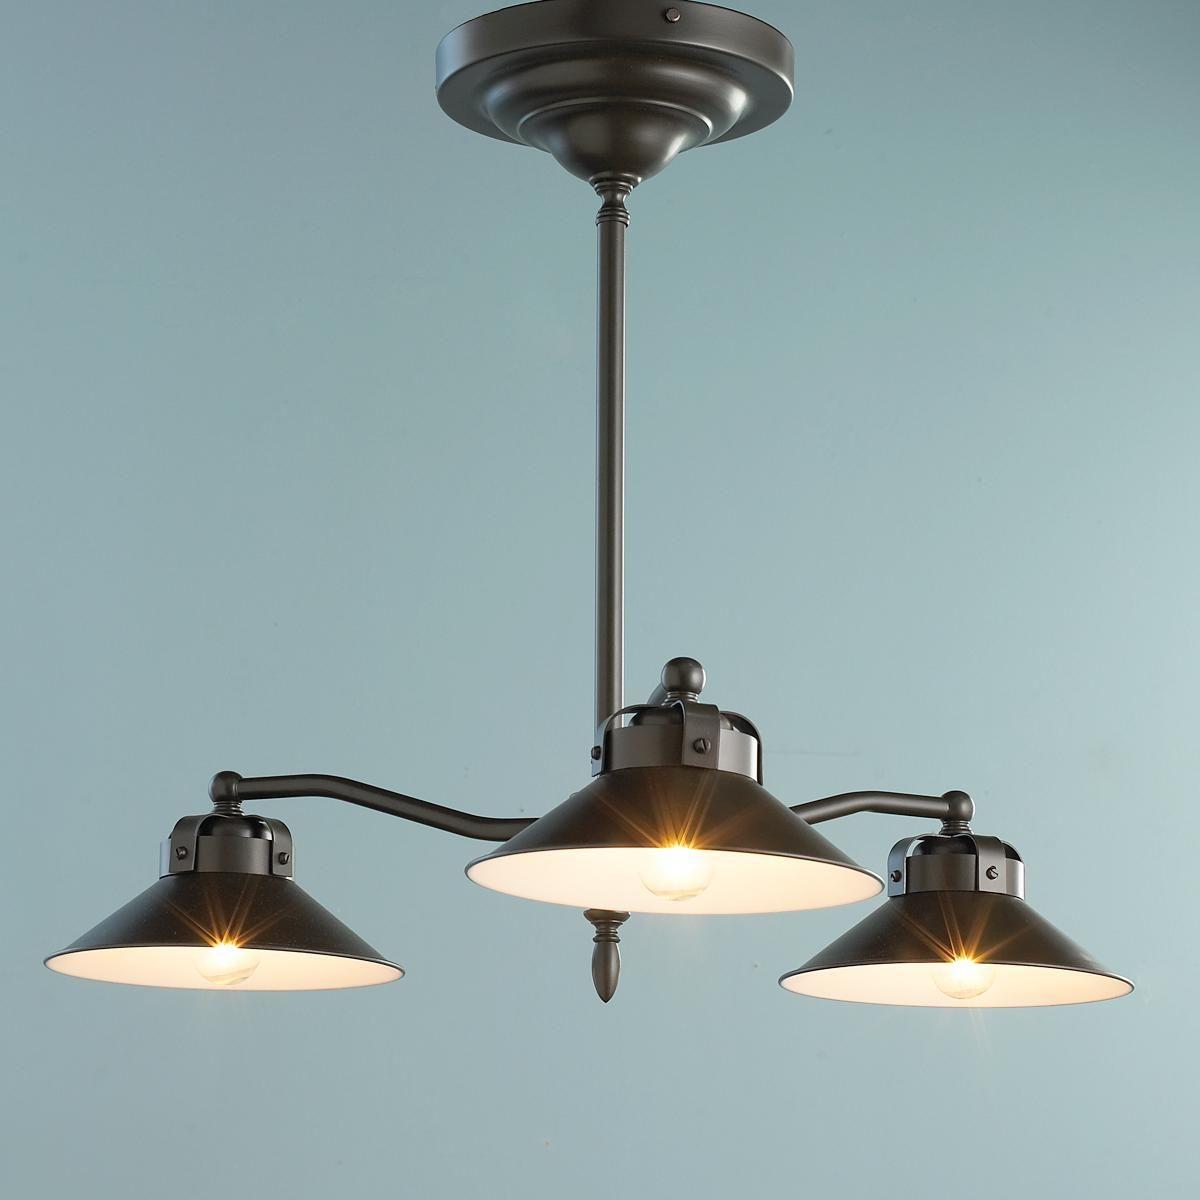 Industrial Inspired Downlight Kitchen Chandelier Dining Room